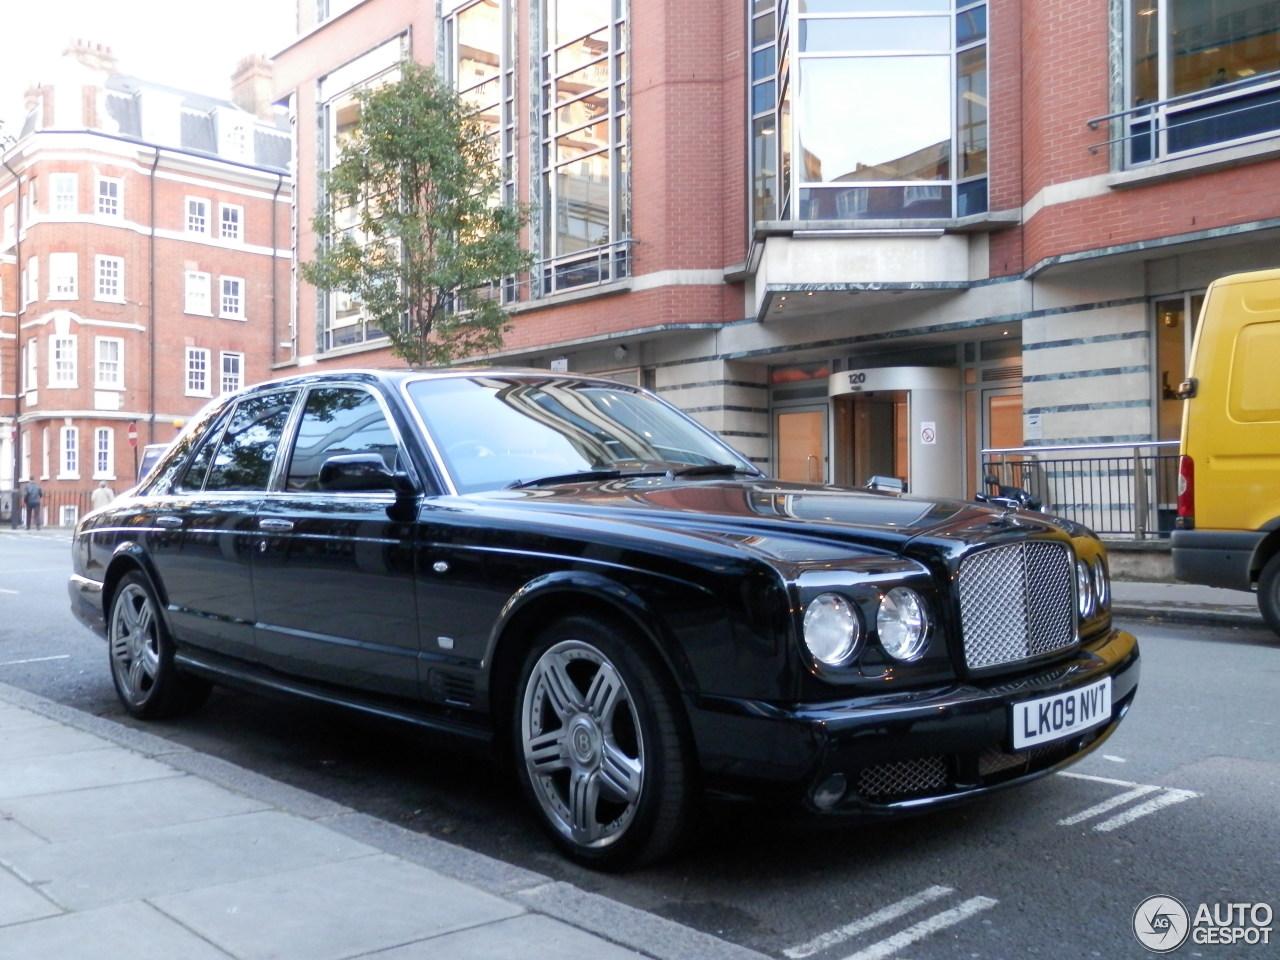 Bentley arnage t 4 november 2012 autogespot 5 i bentley arnage t 5 vanachro Image collections